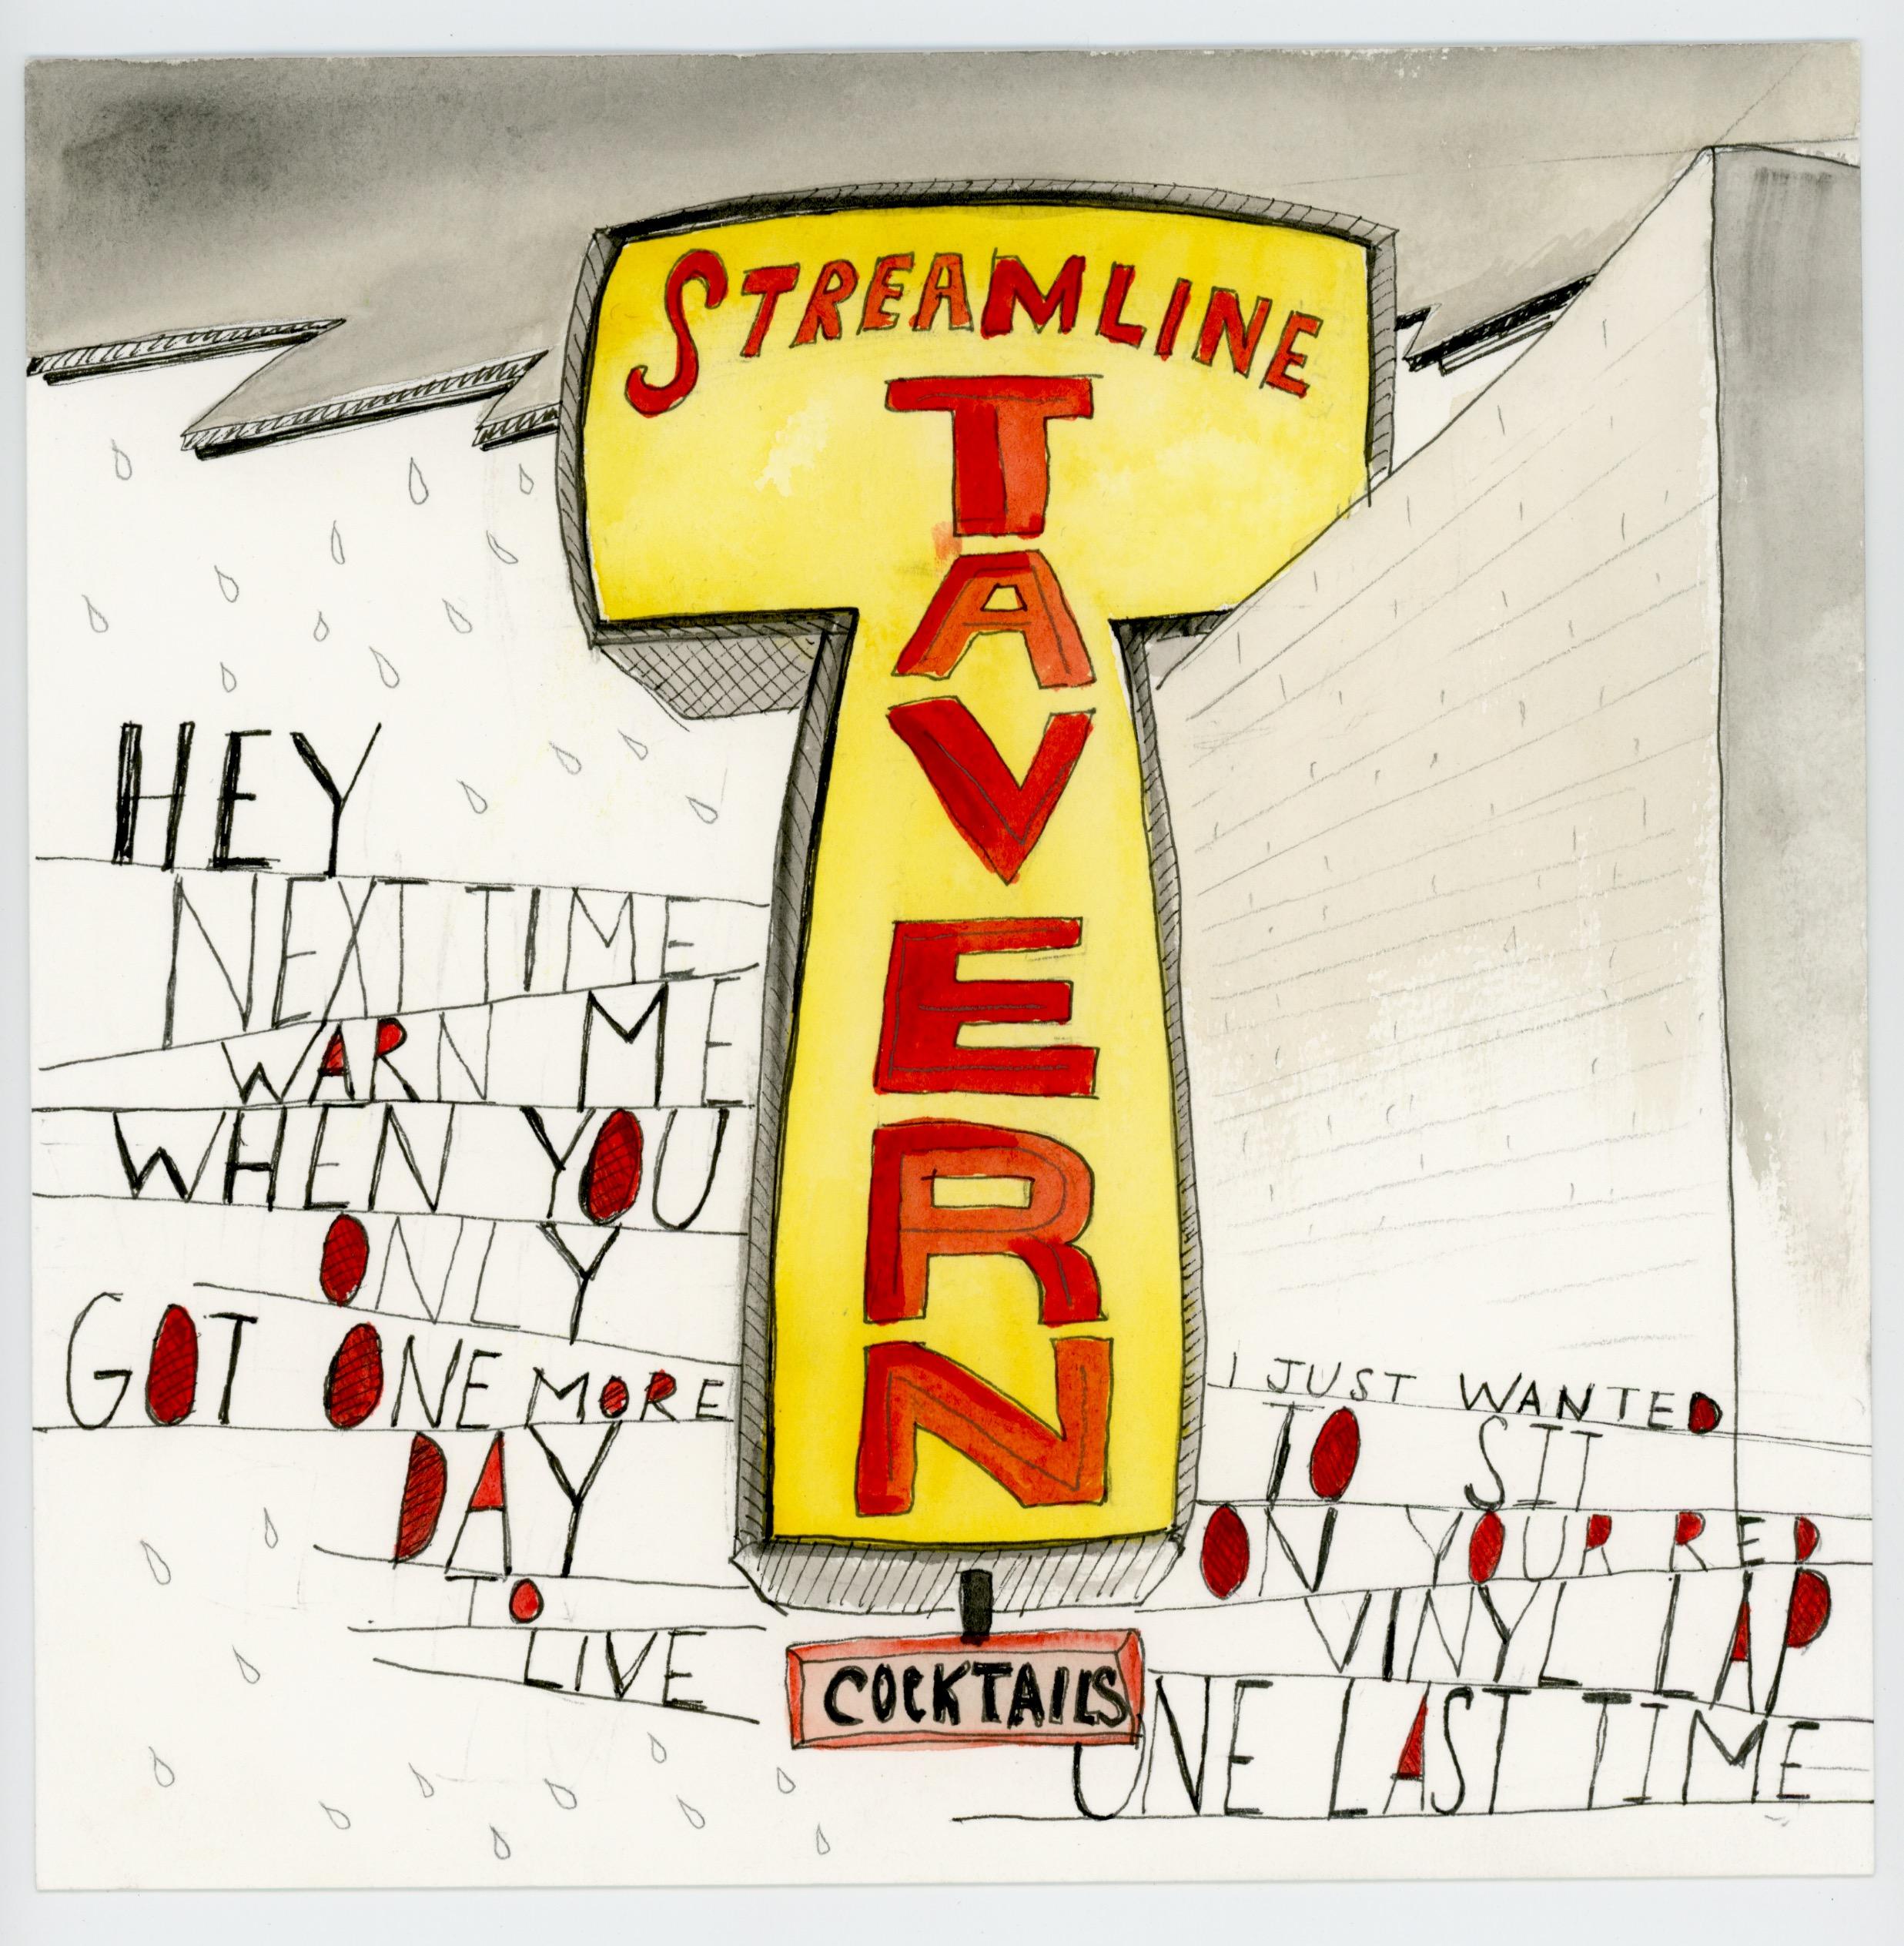 The Streamline